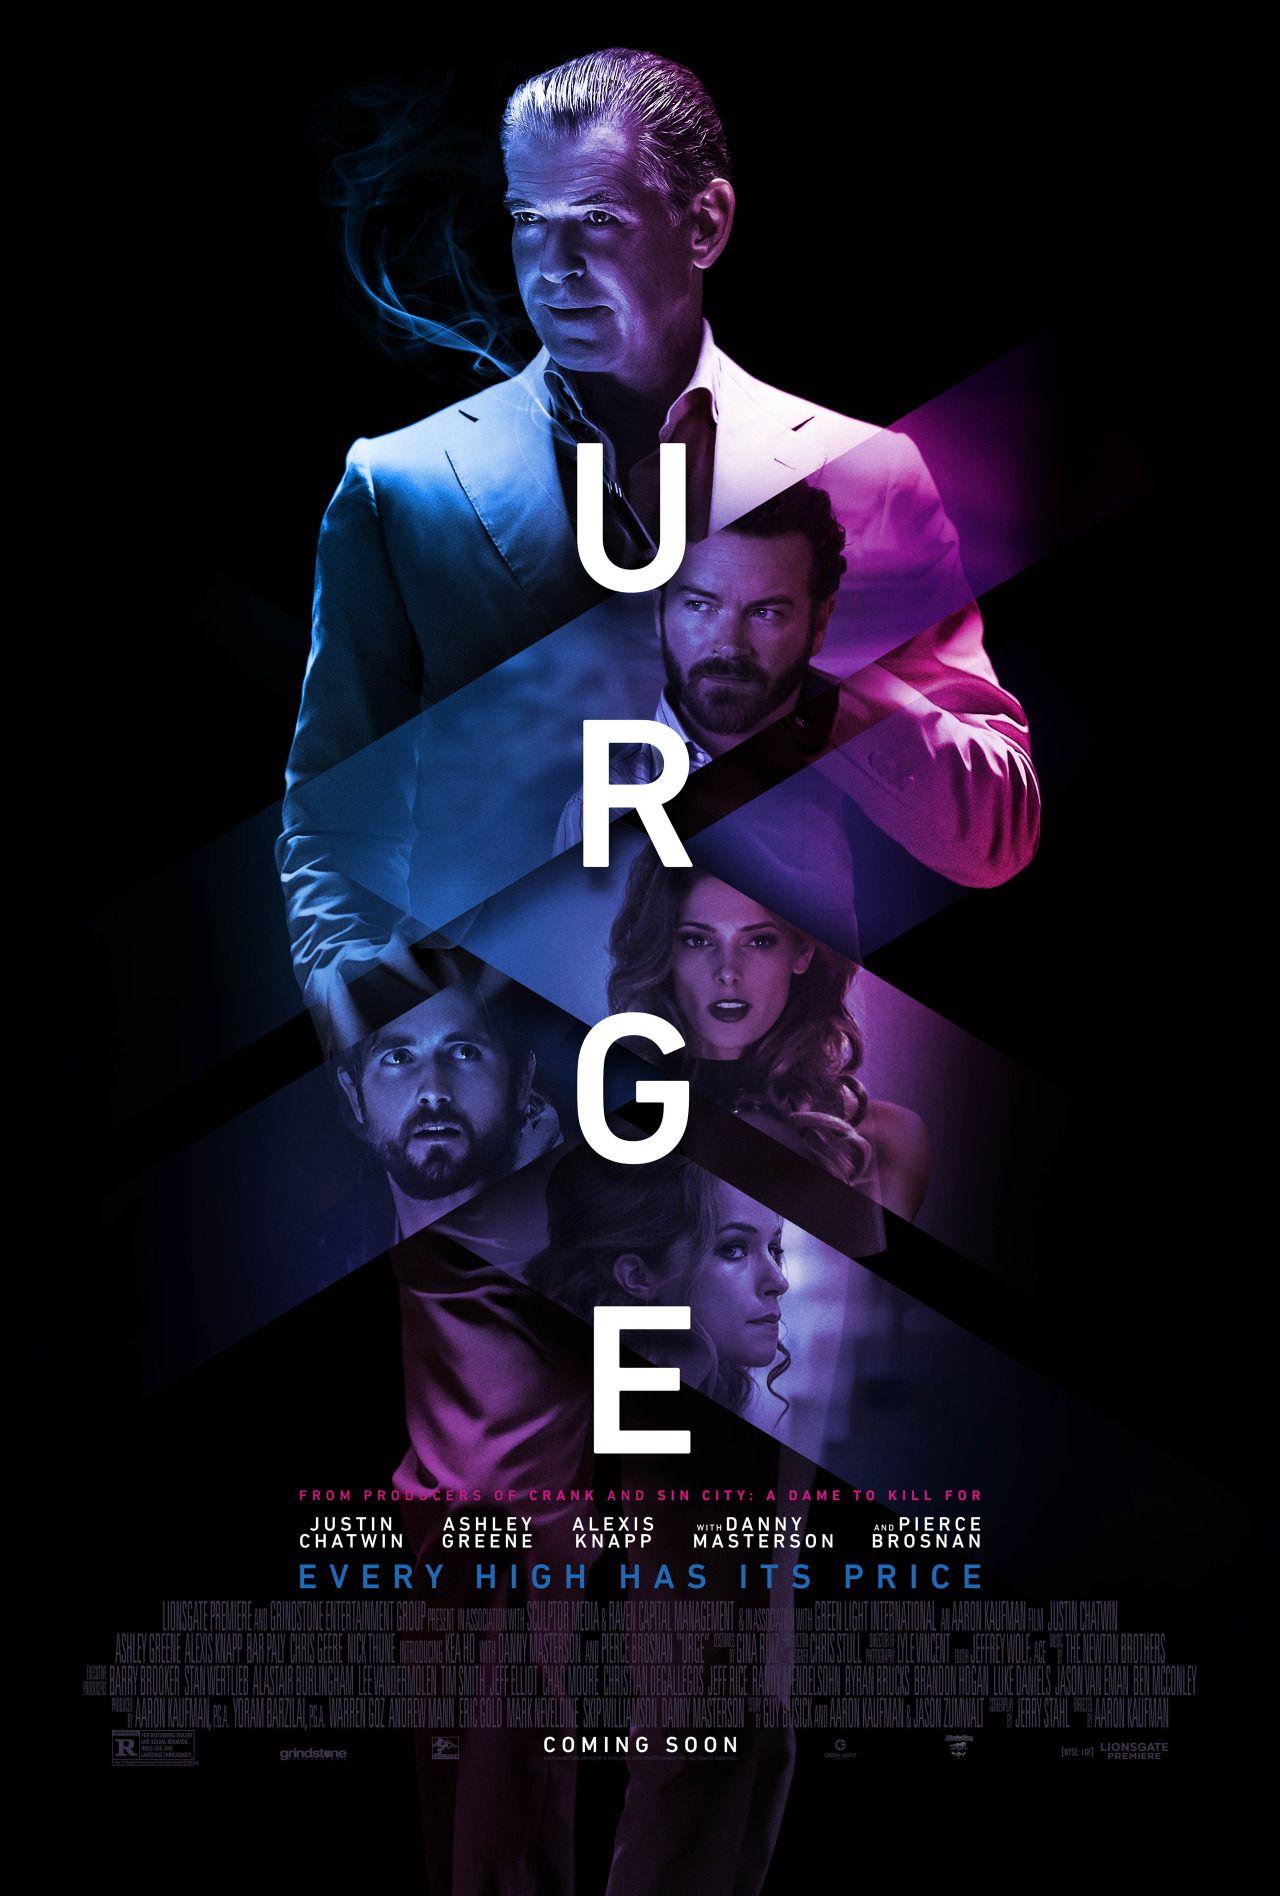 urge-poster.jpg